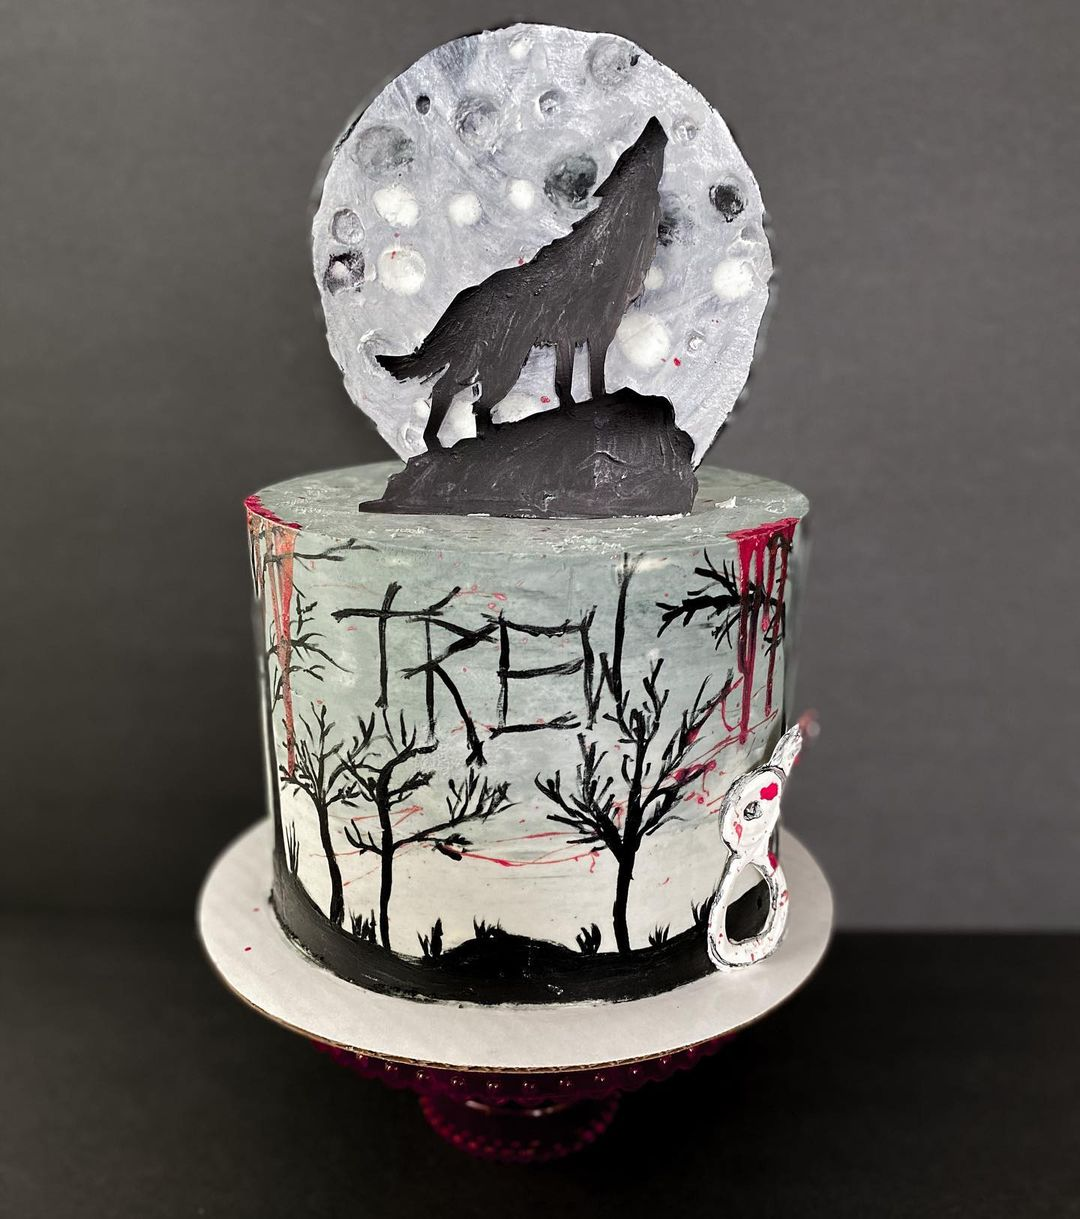 Tarta lobo y luna